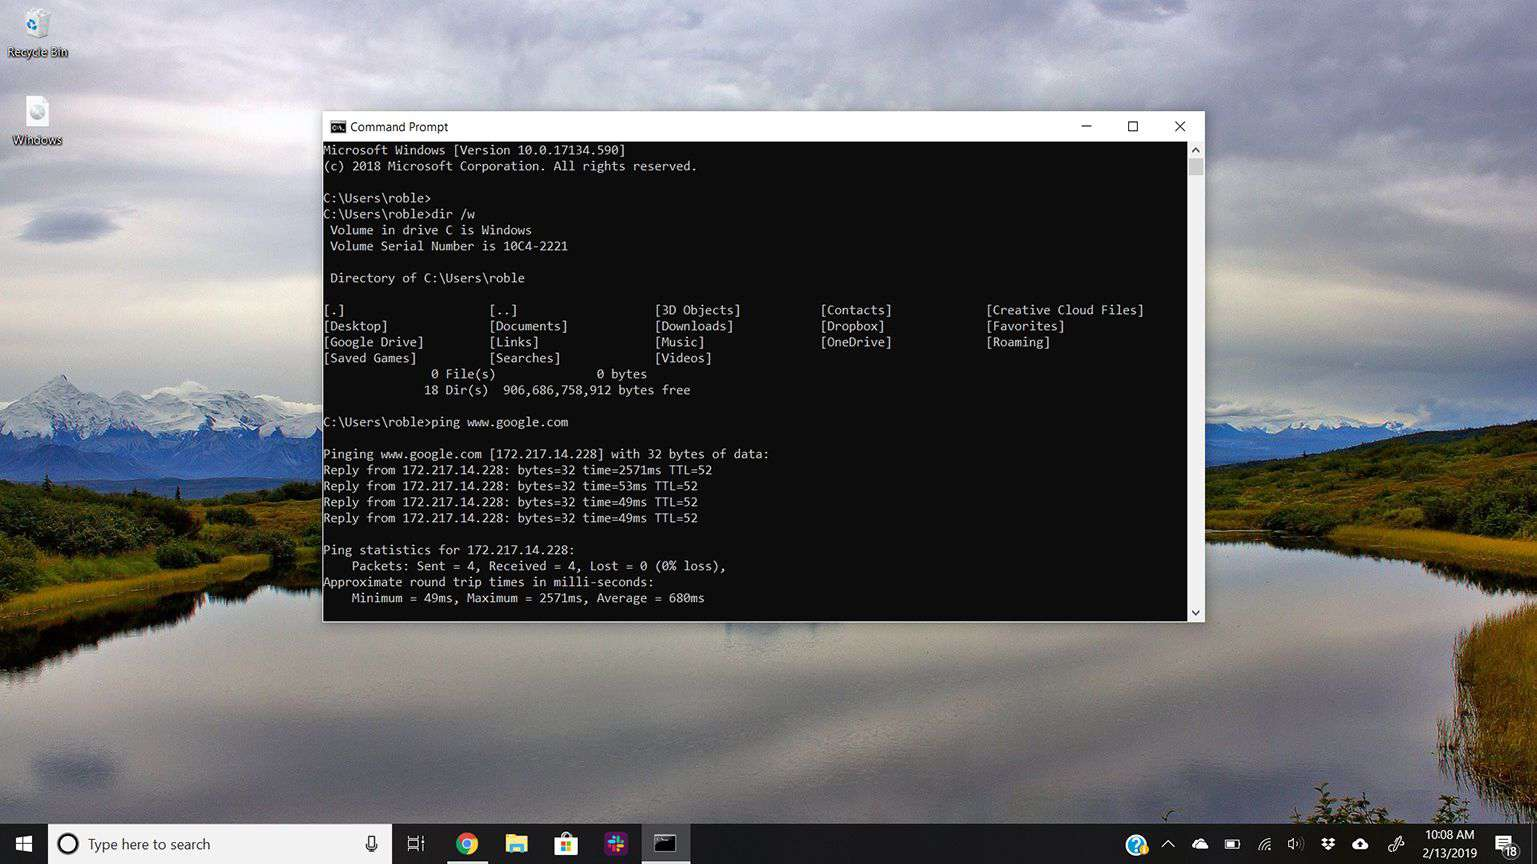 Command Prompt on Windows 10 Desktop